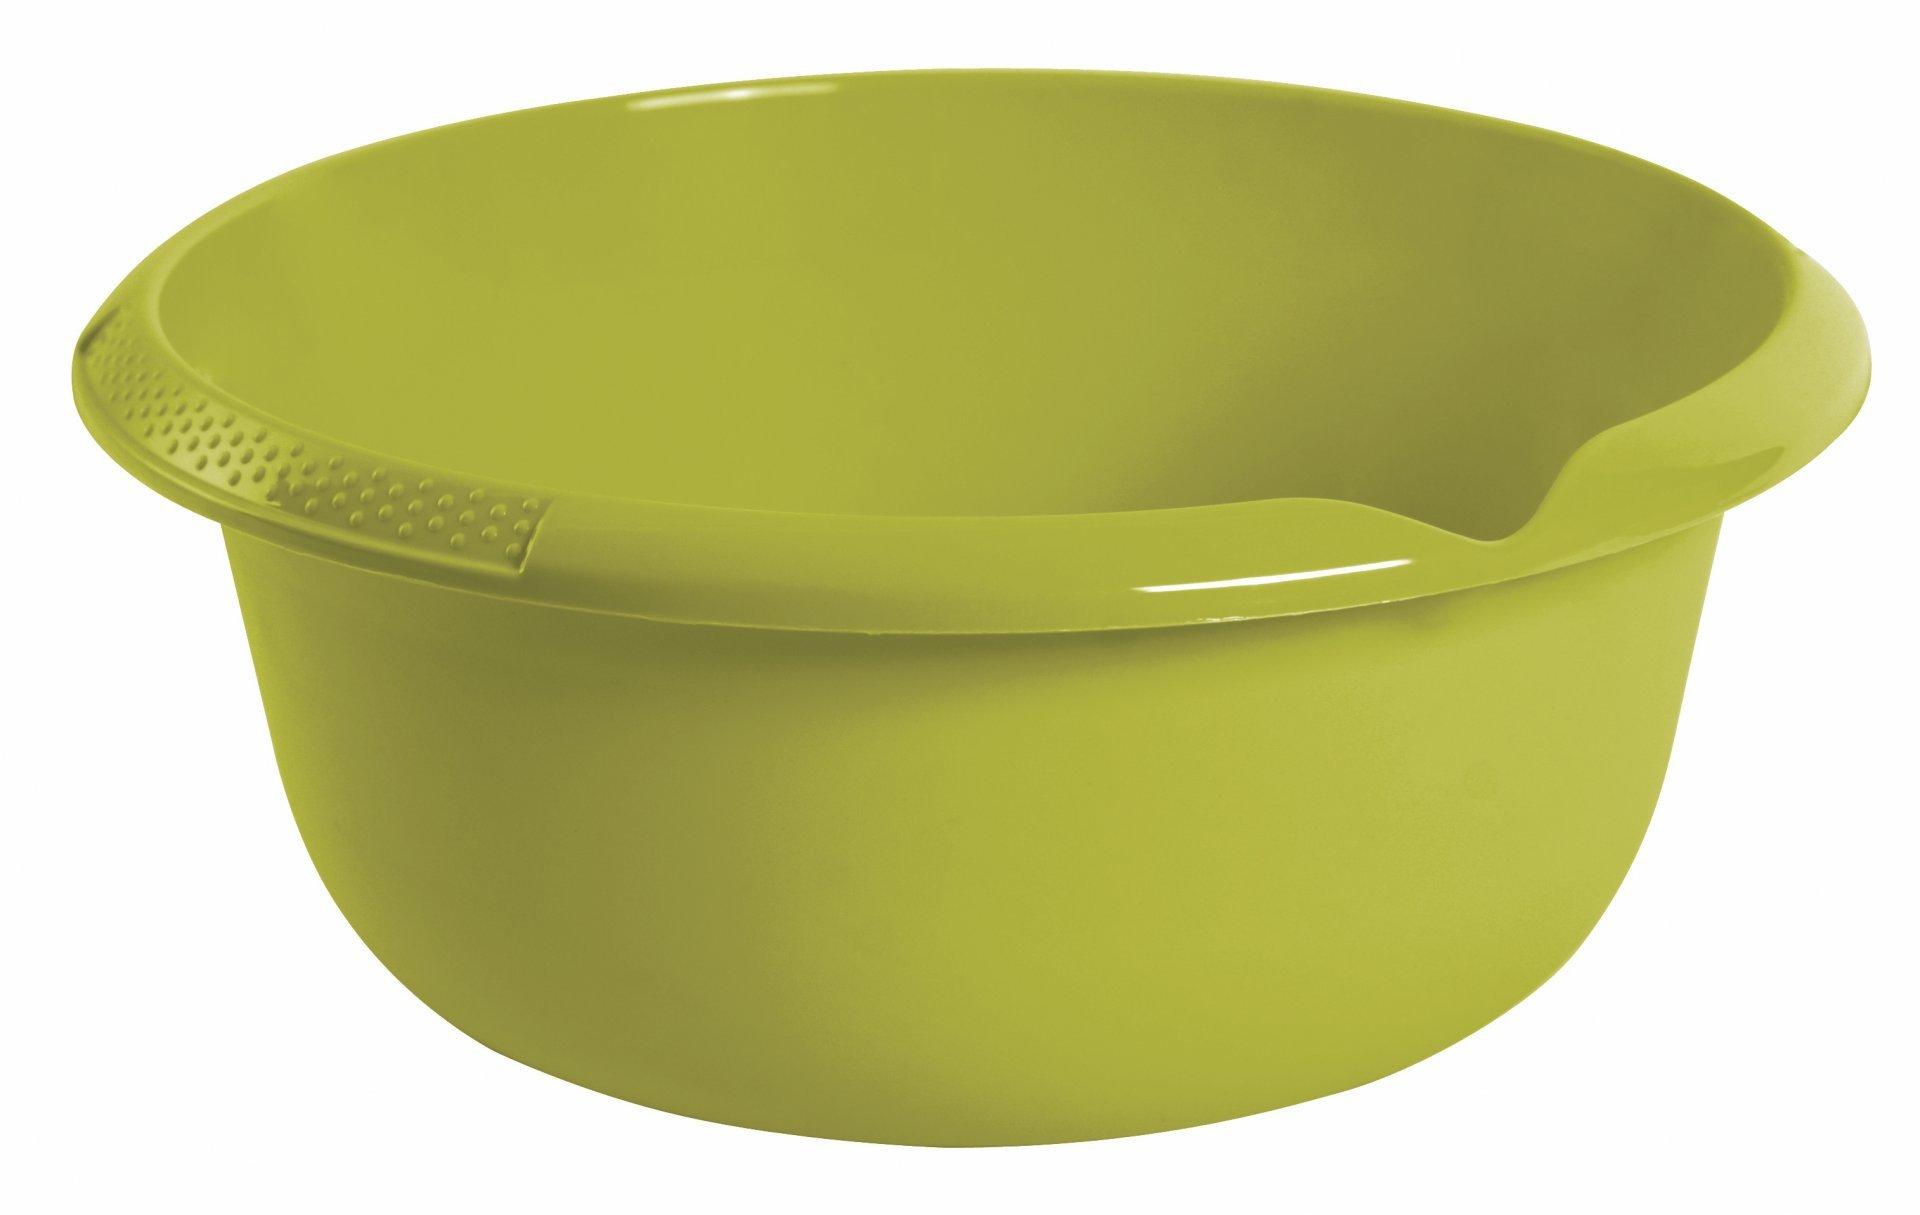 Keeeper miska kulatá s výlevkou, björk, zelená 3,5l